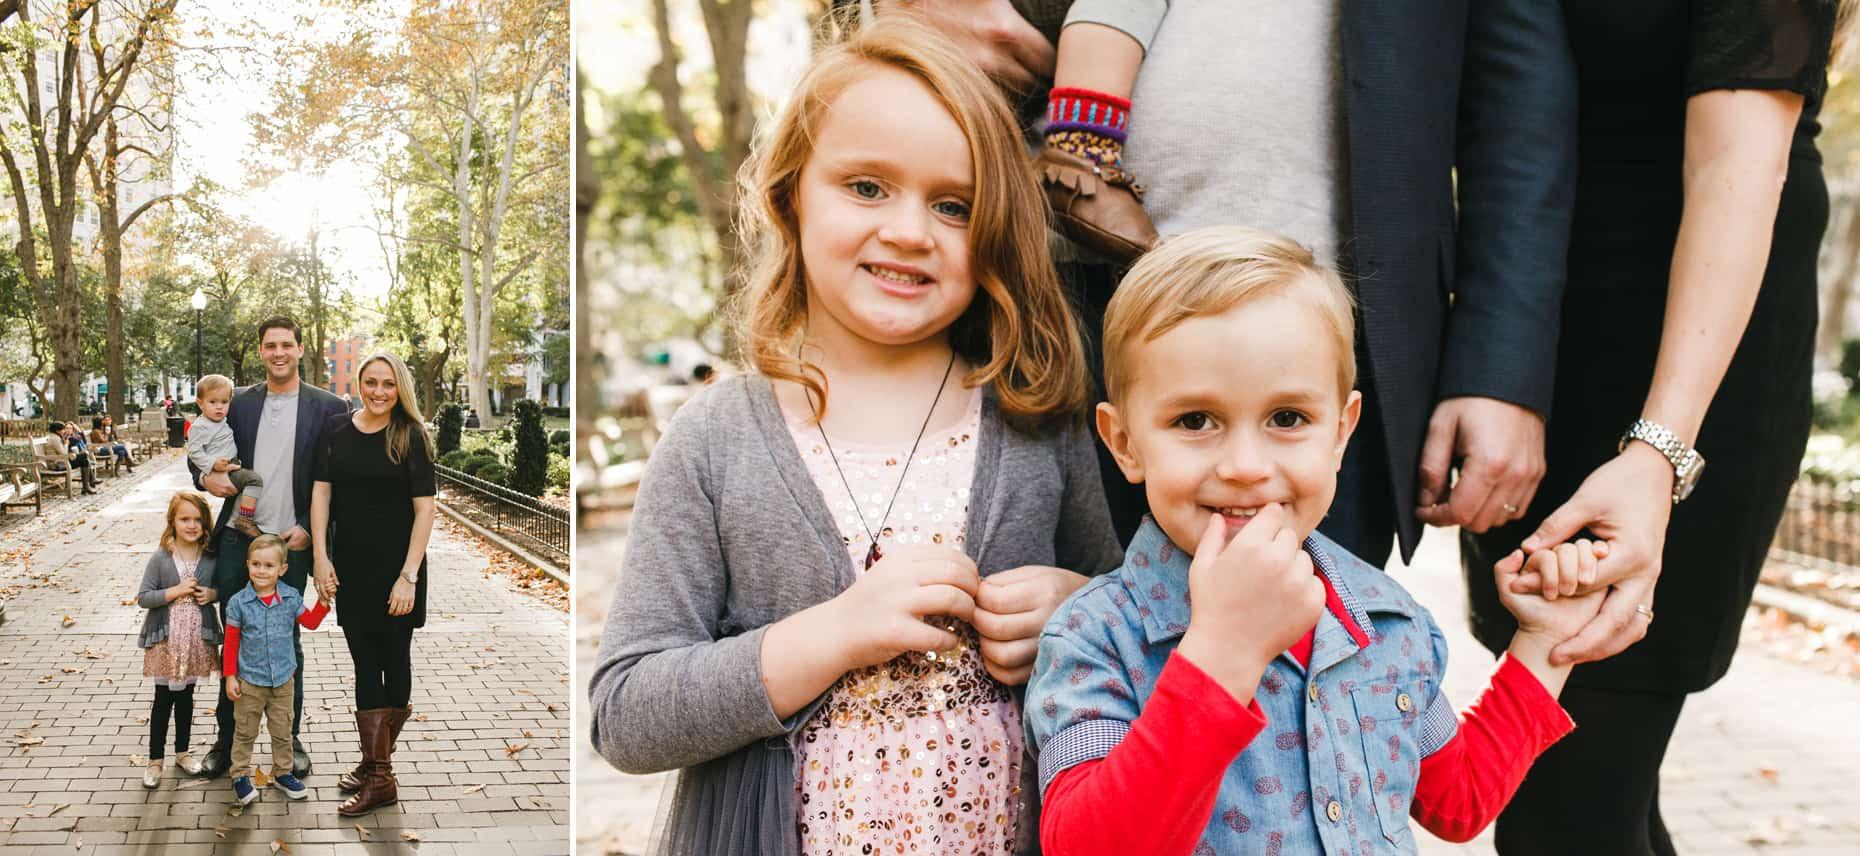 Kids Photographer Chestnut Hill